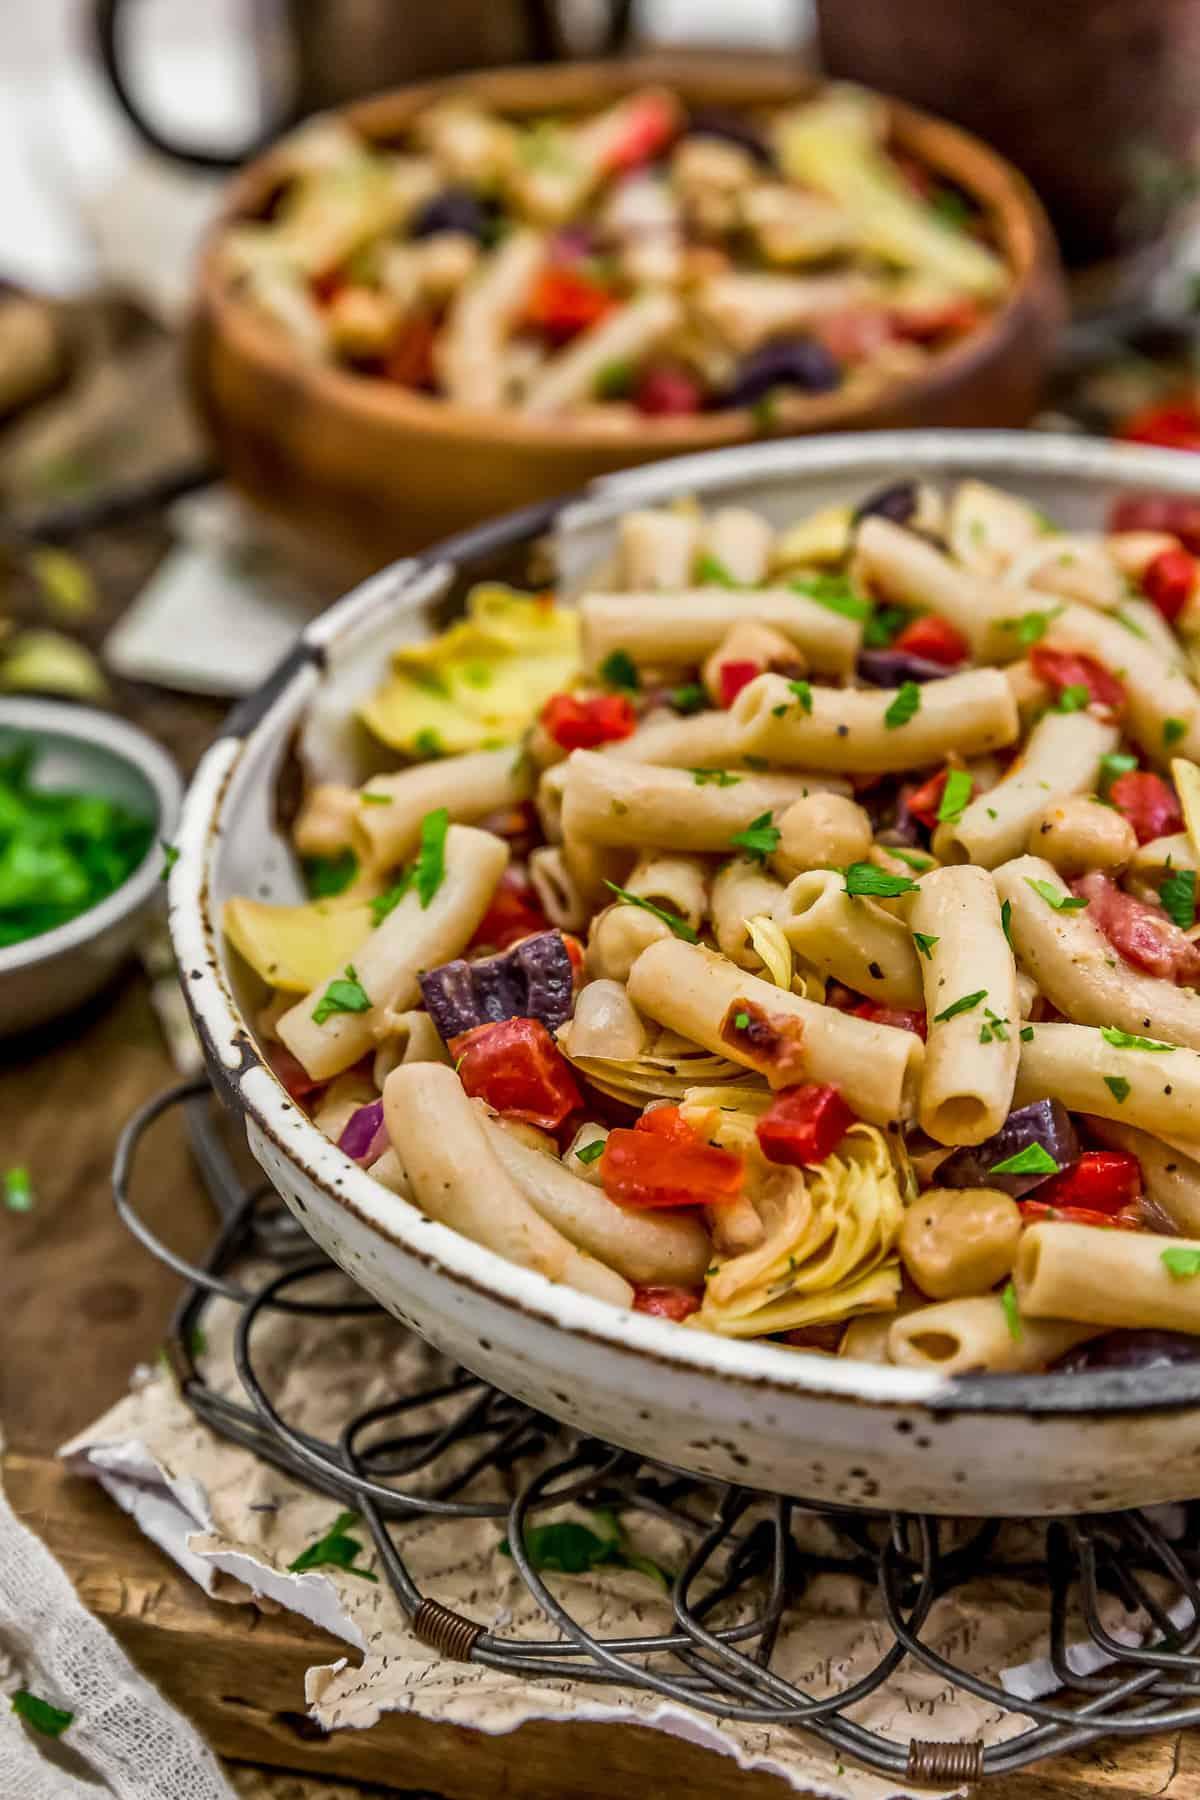 Bowls of Mediterranean Pasta Salad